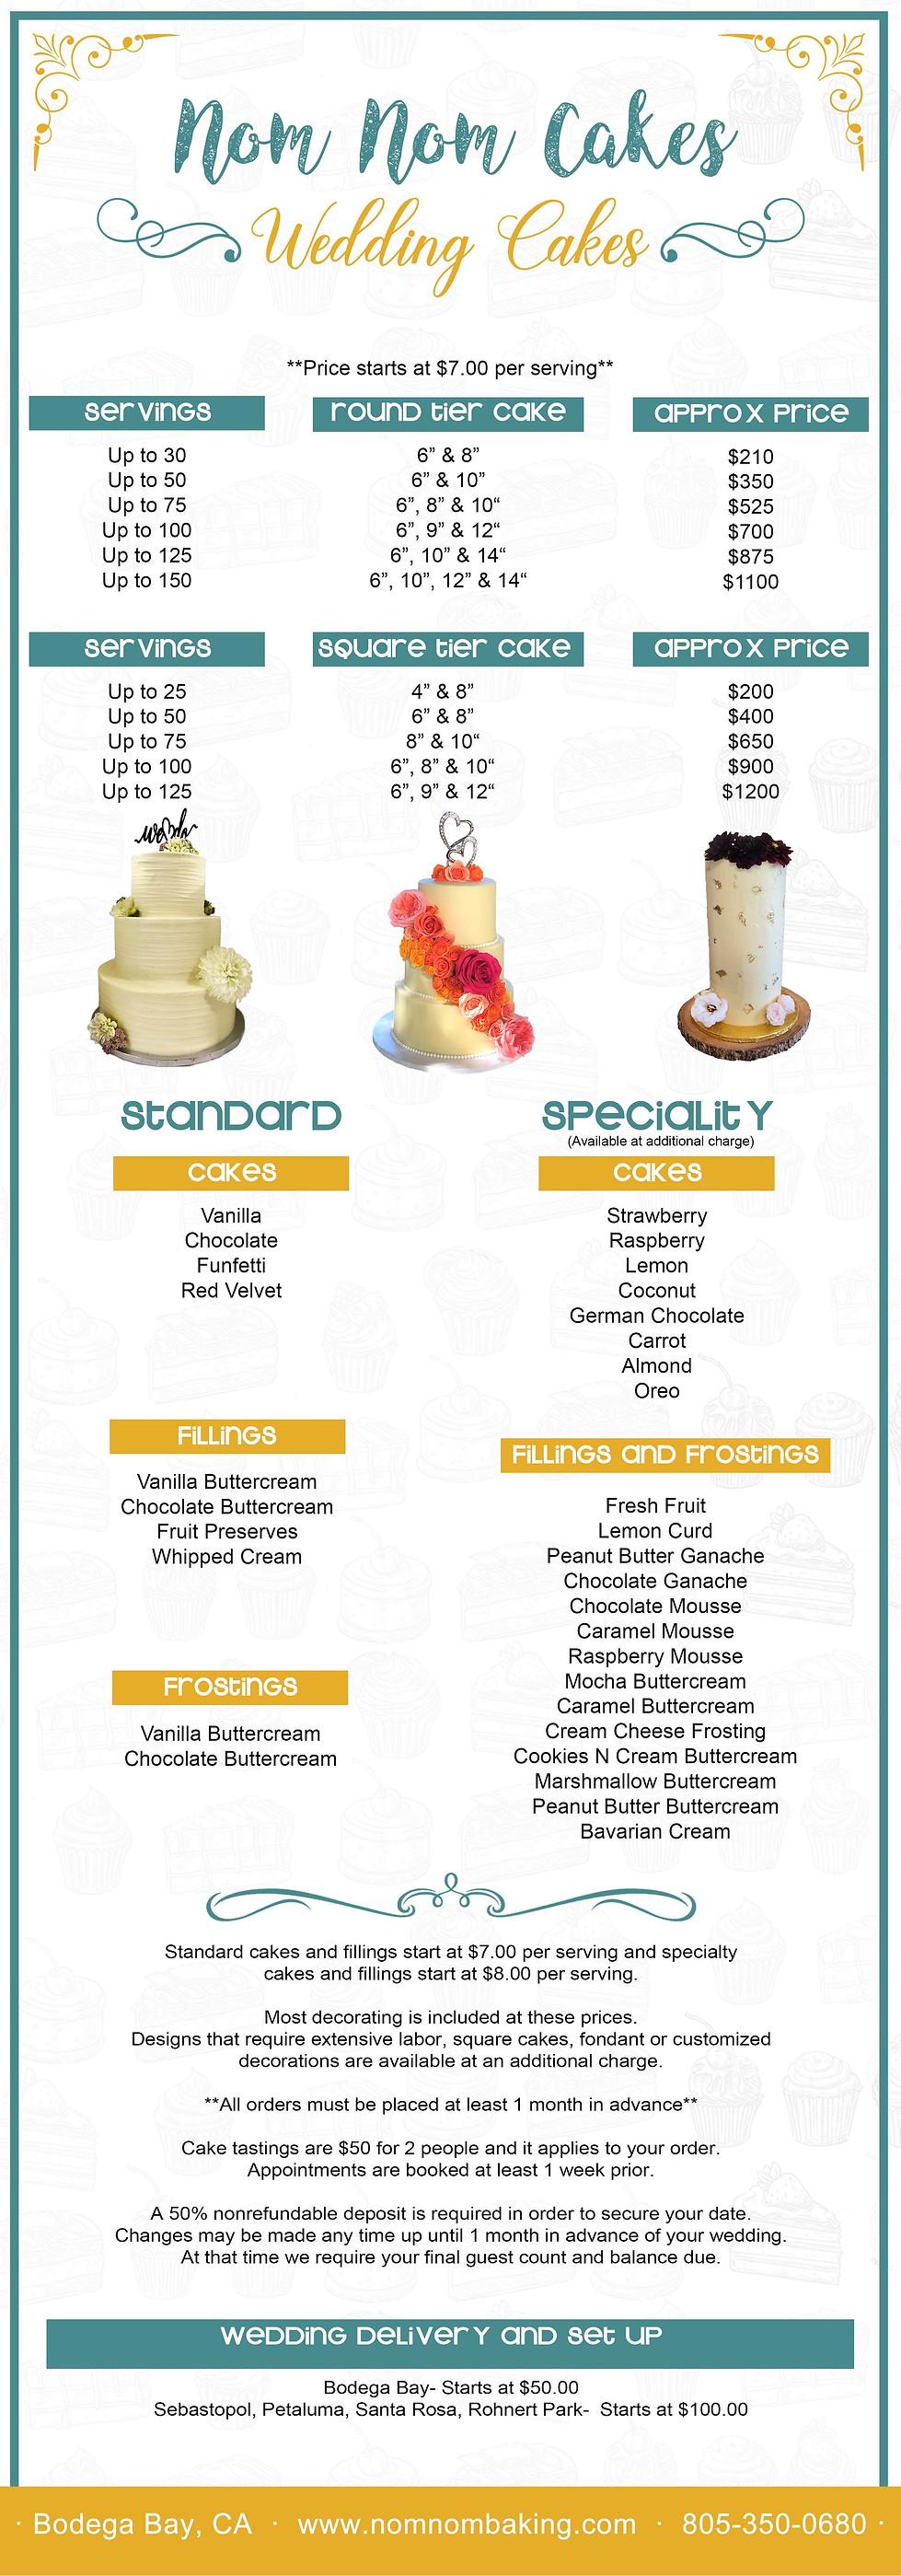 Wedding-cakes-website.jpg